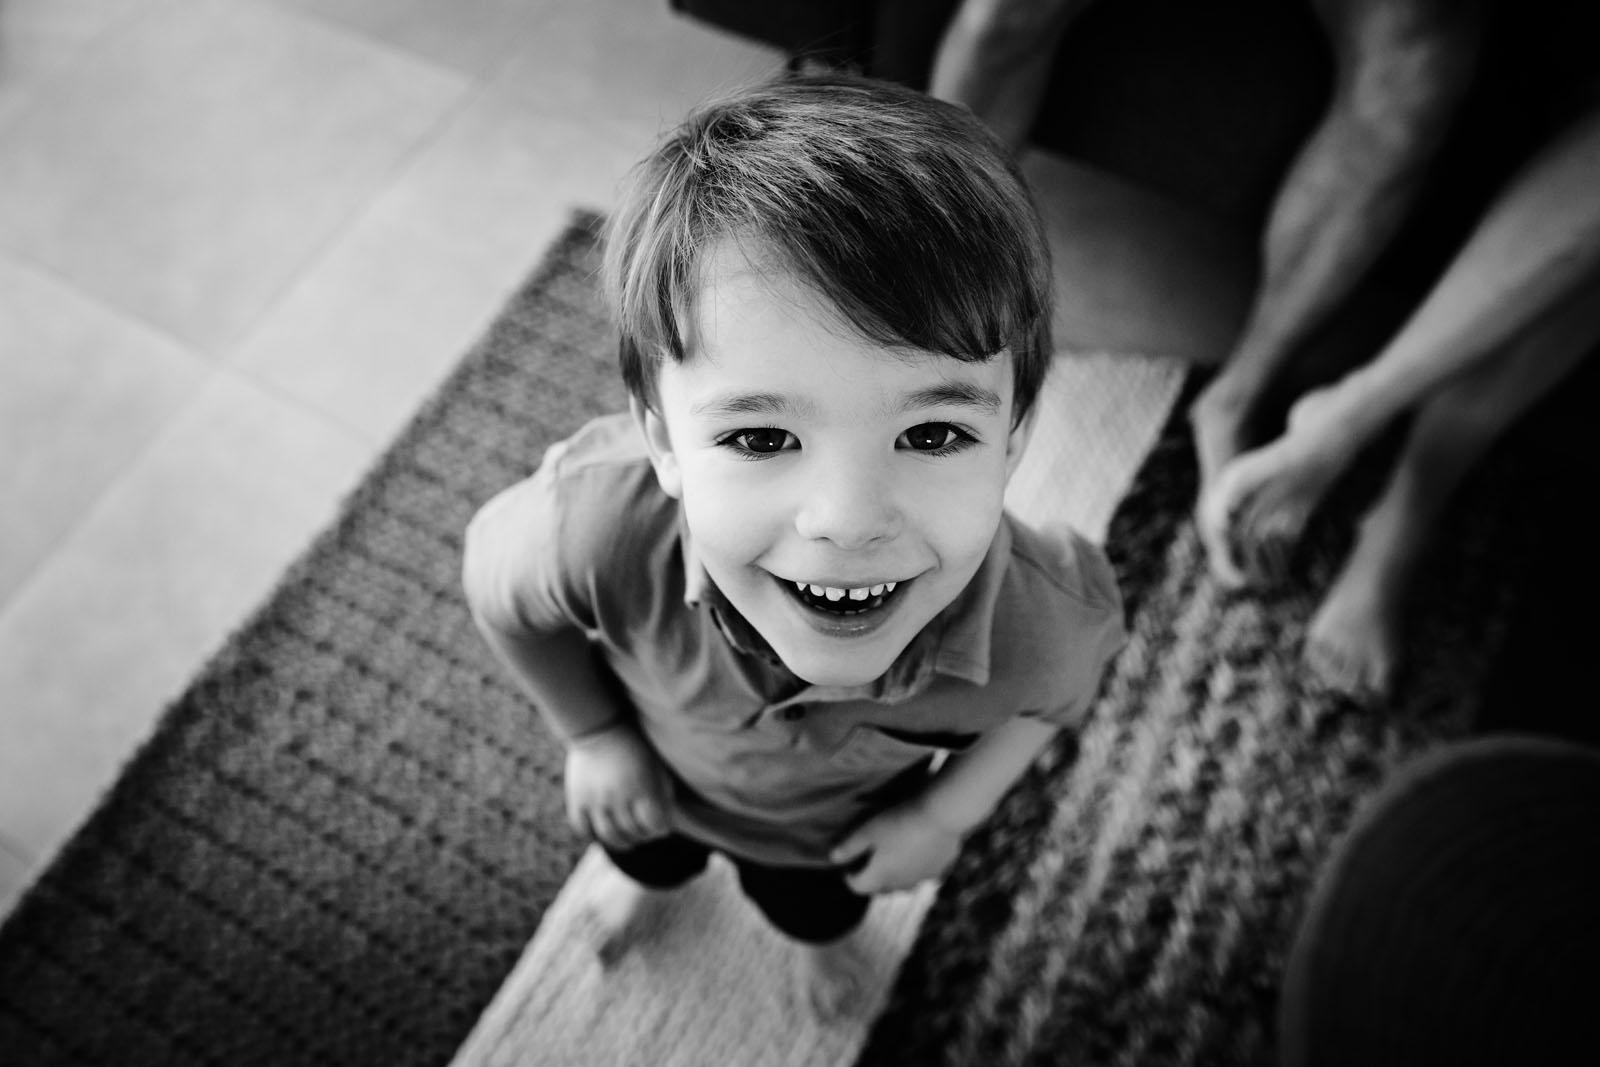 Image14 boy looking up at camera black and white lisa tichane